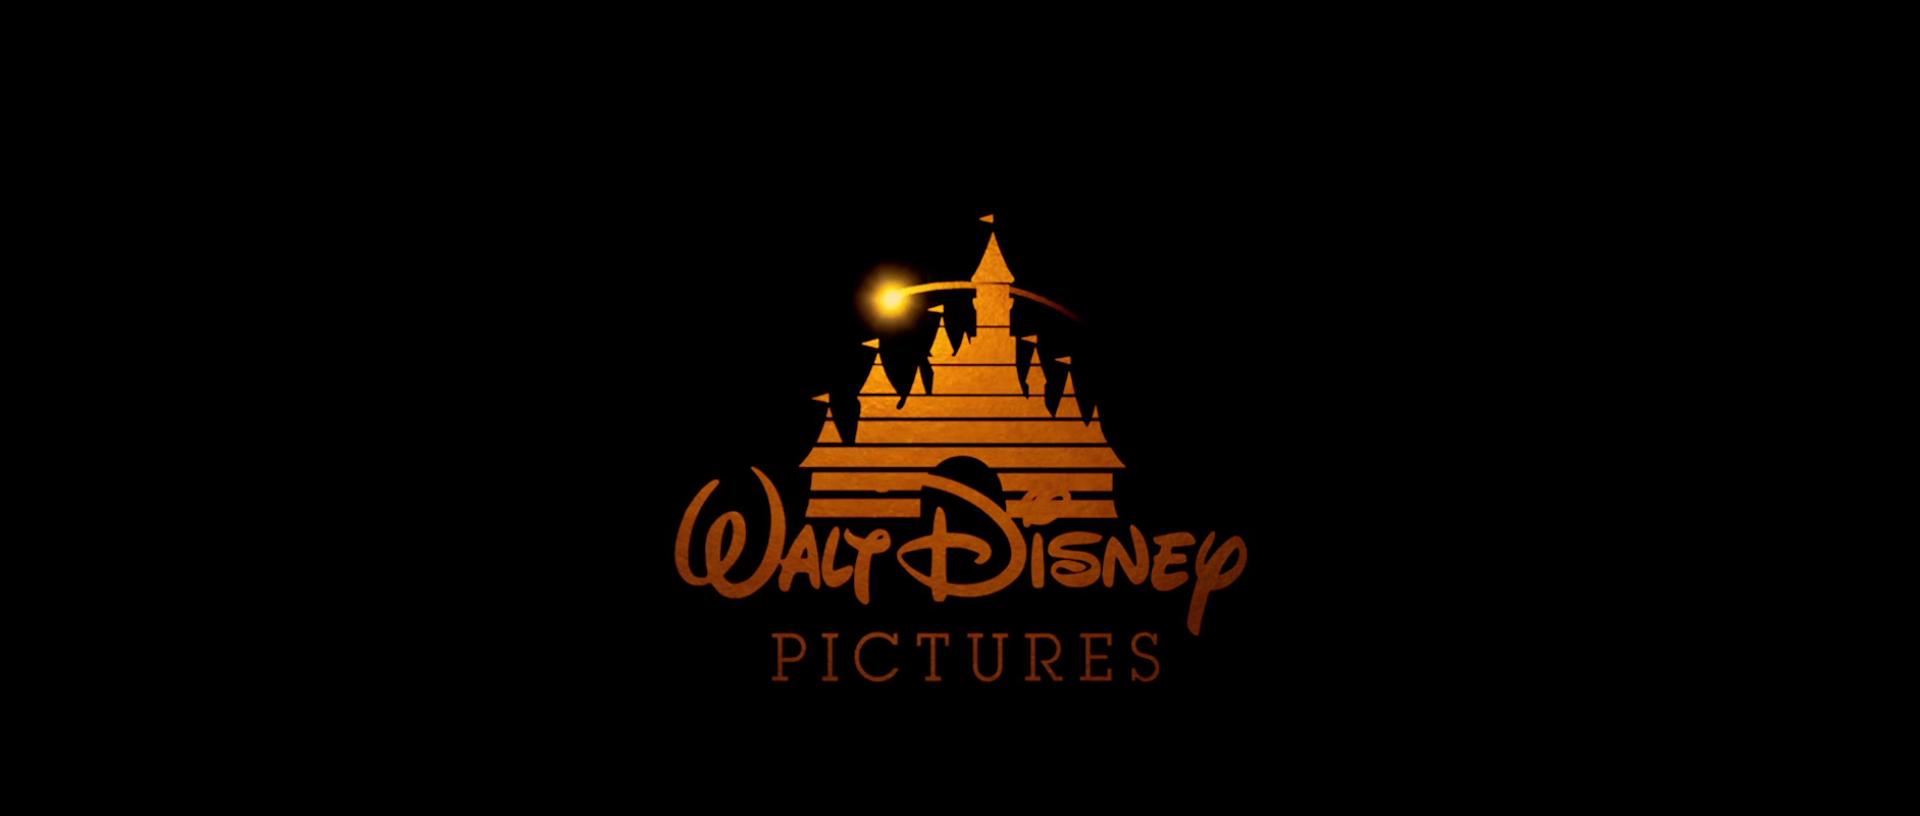 File:Walt Disney Pictures Flashlight Version (2000).png